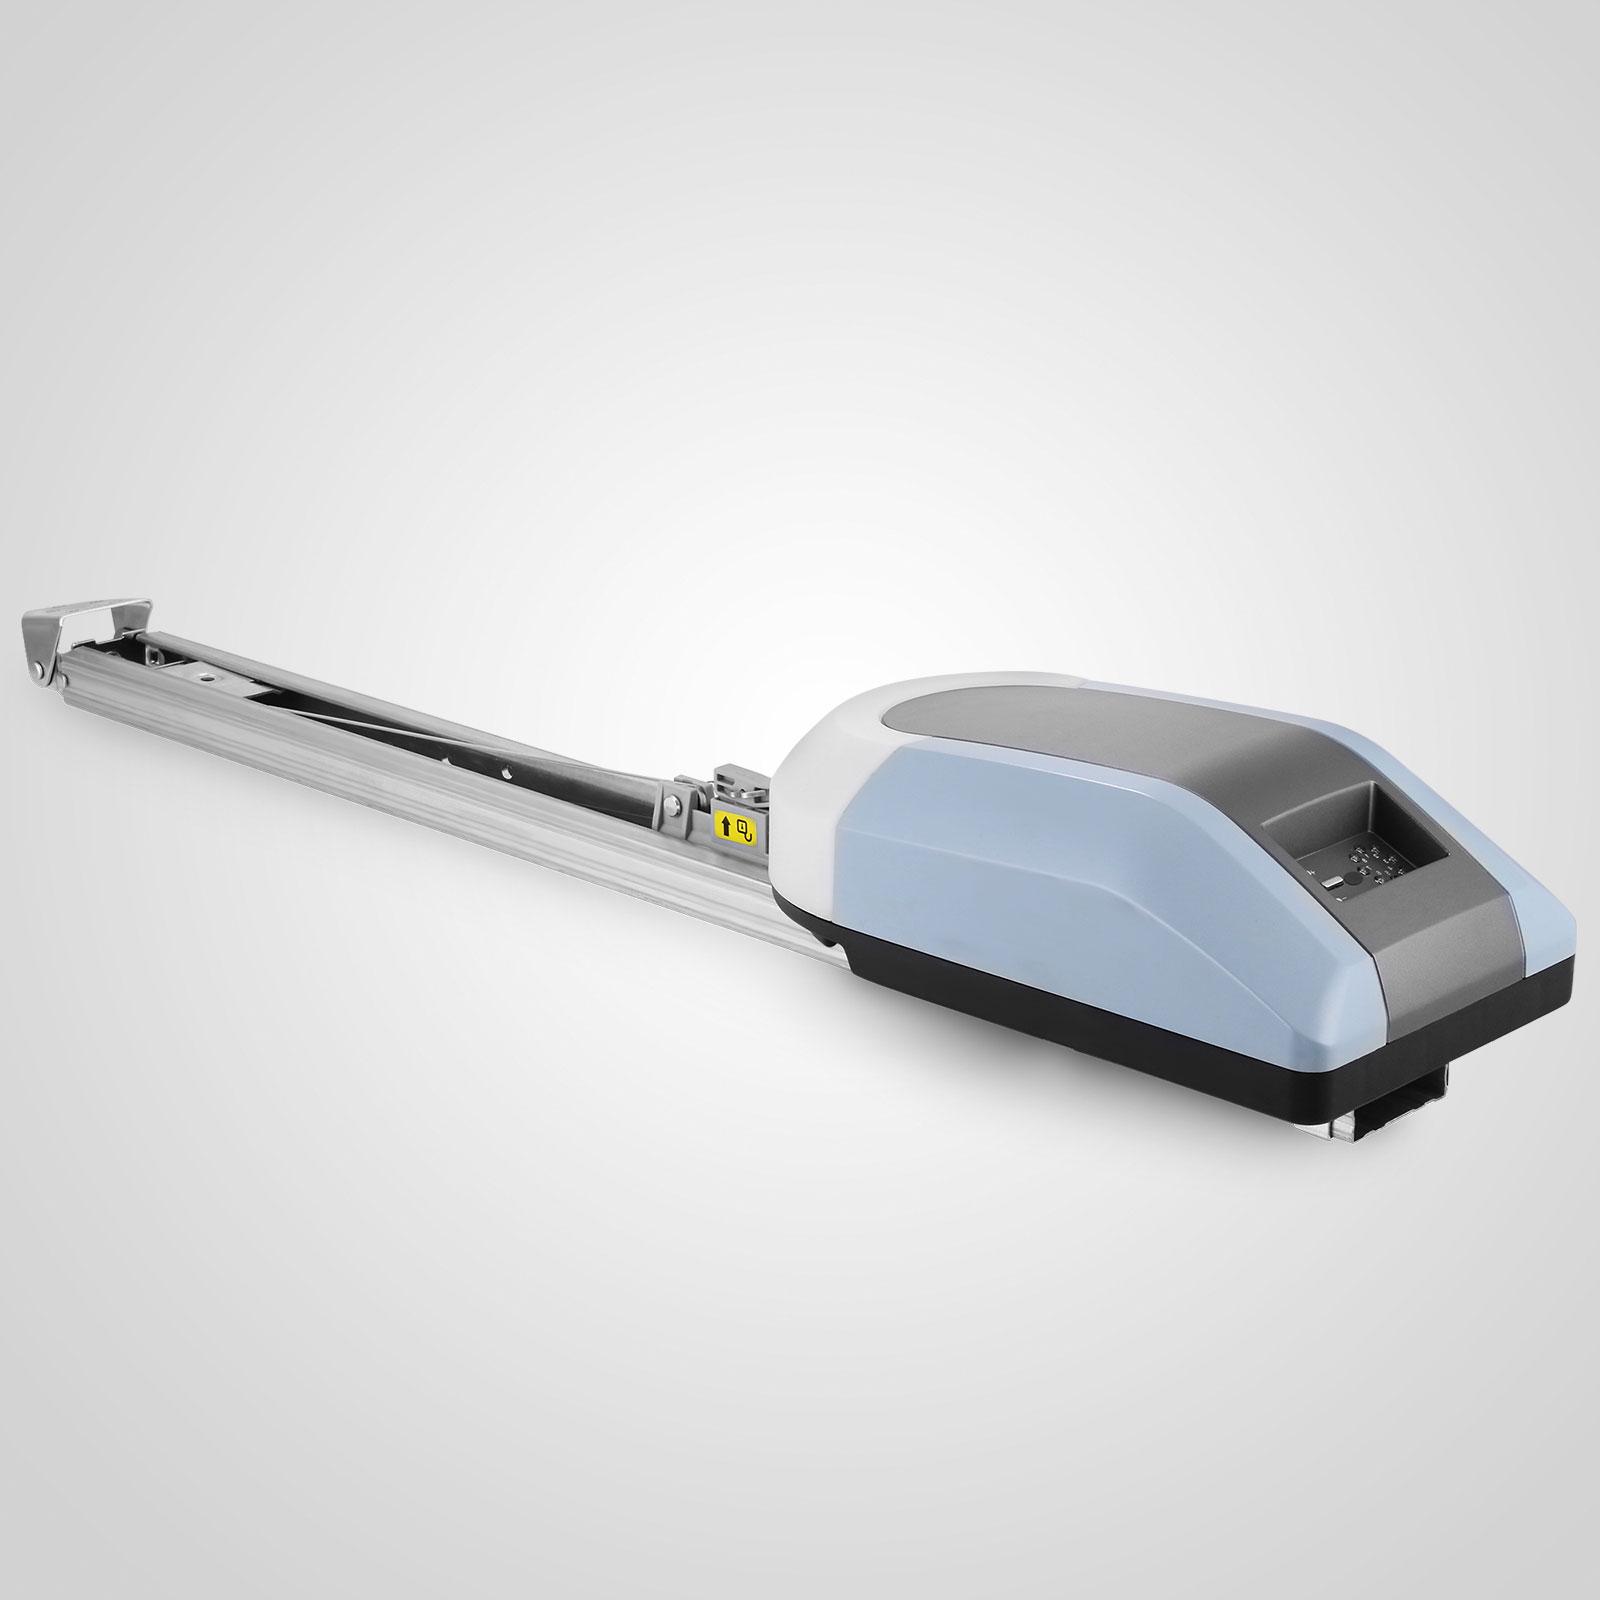 Vevor Power Drive 1000n Automatic Electric Garage Door